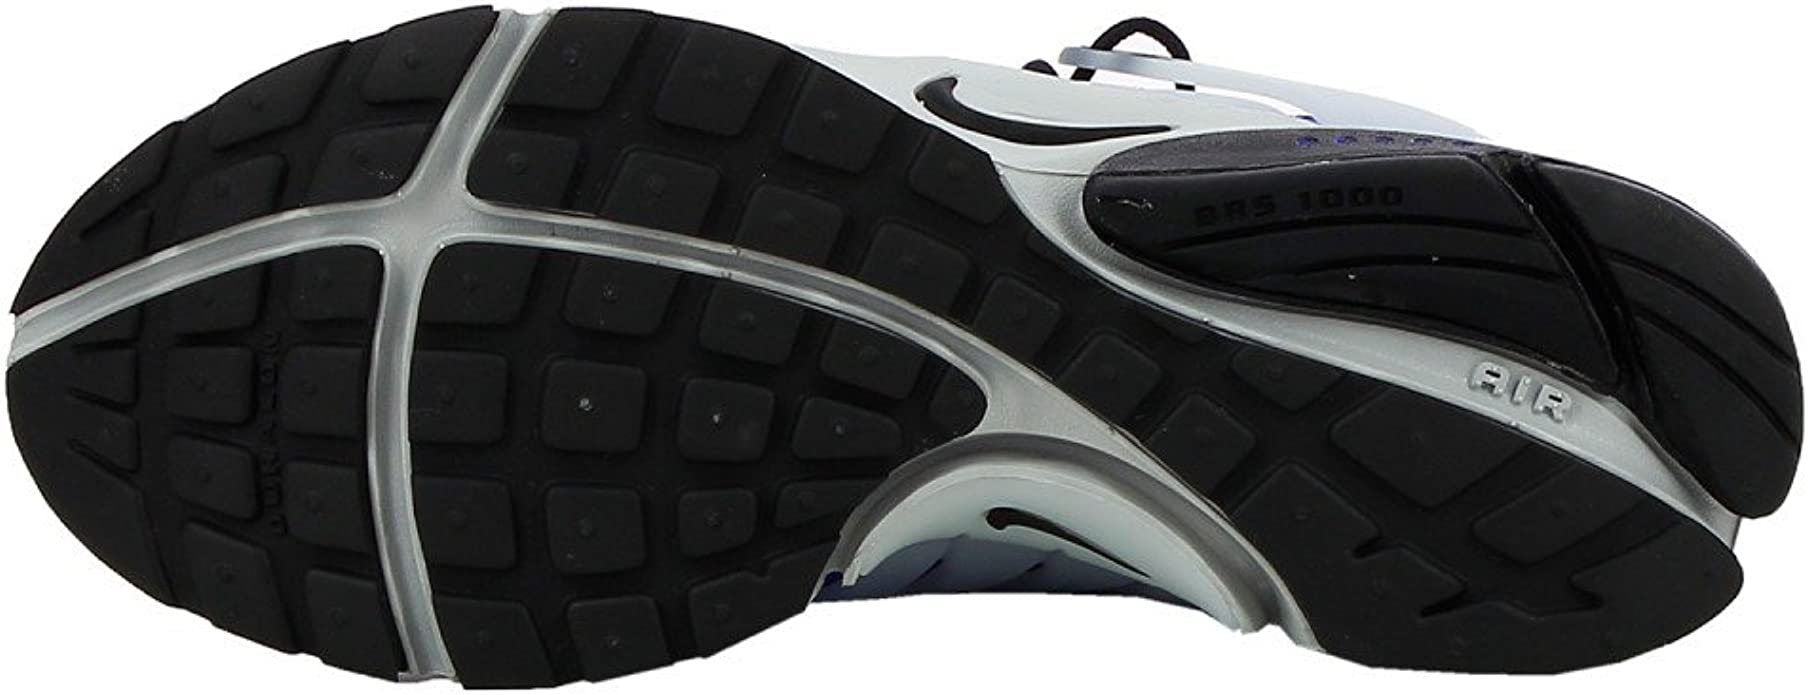 Nike Basket Air Presto 305919 501: : Chaussures